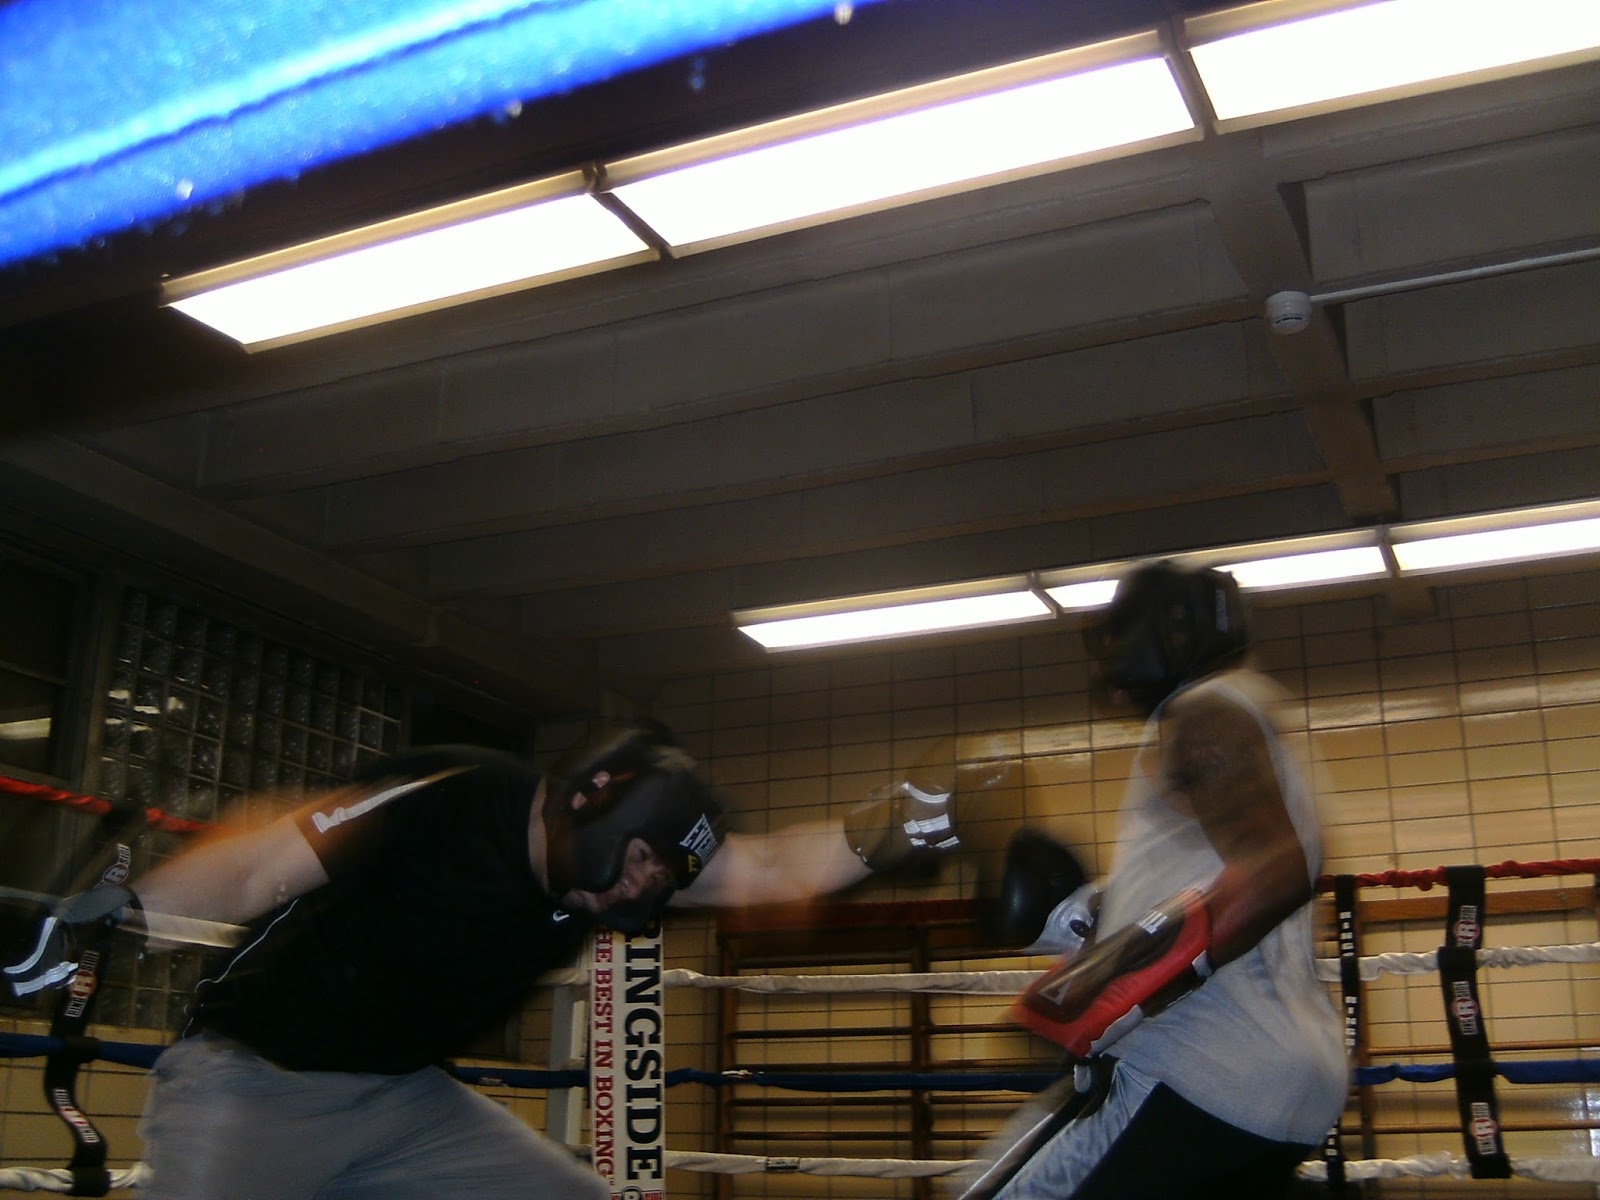 Boxing mid life steam bath gym